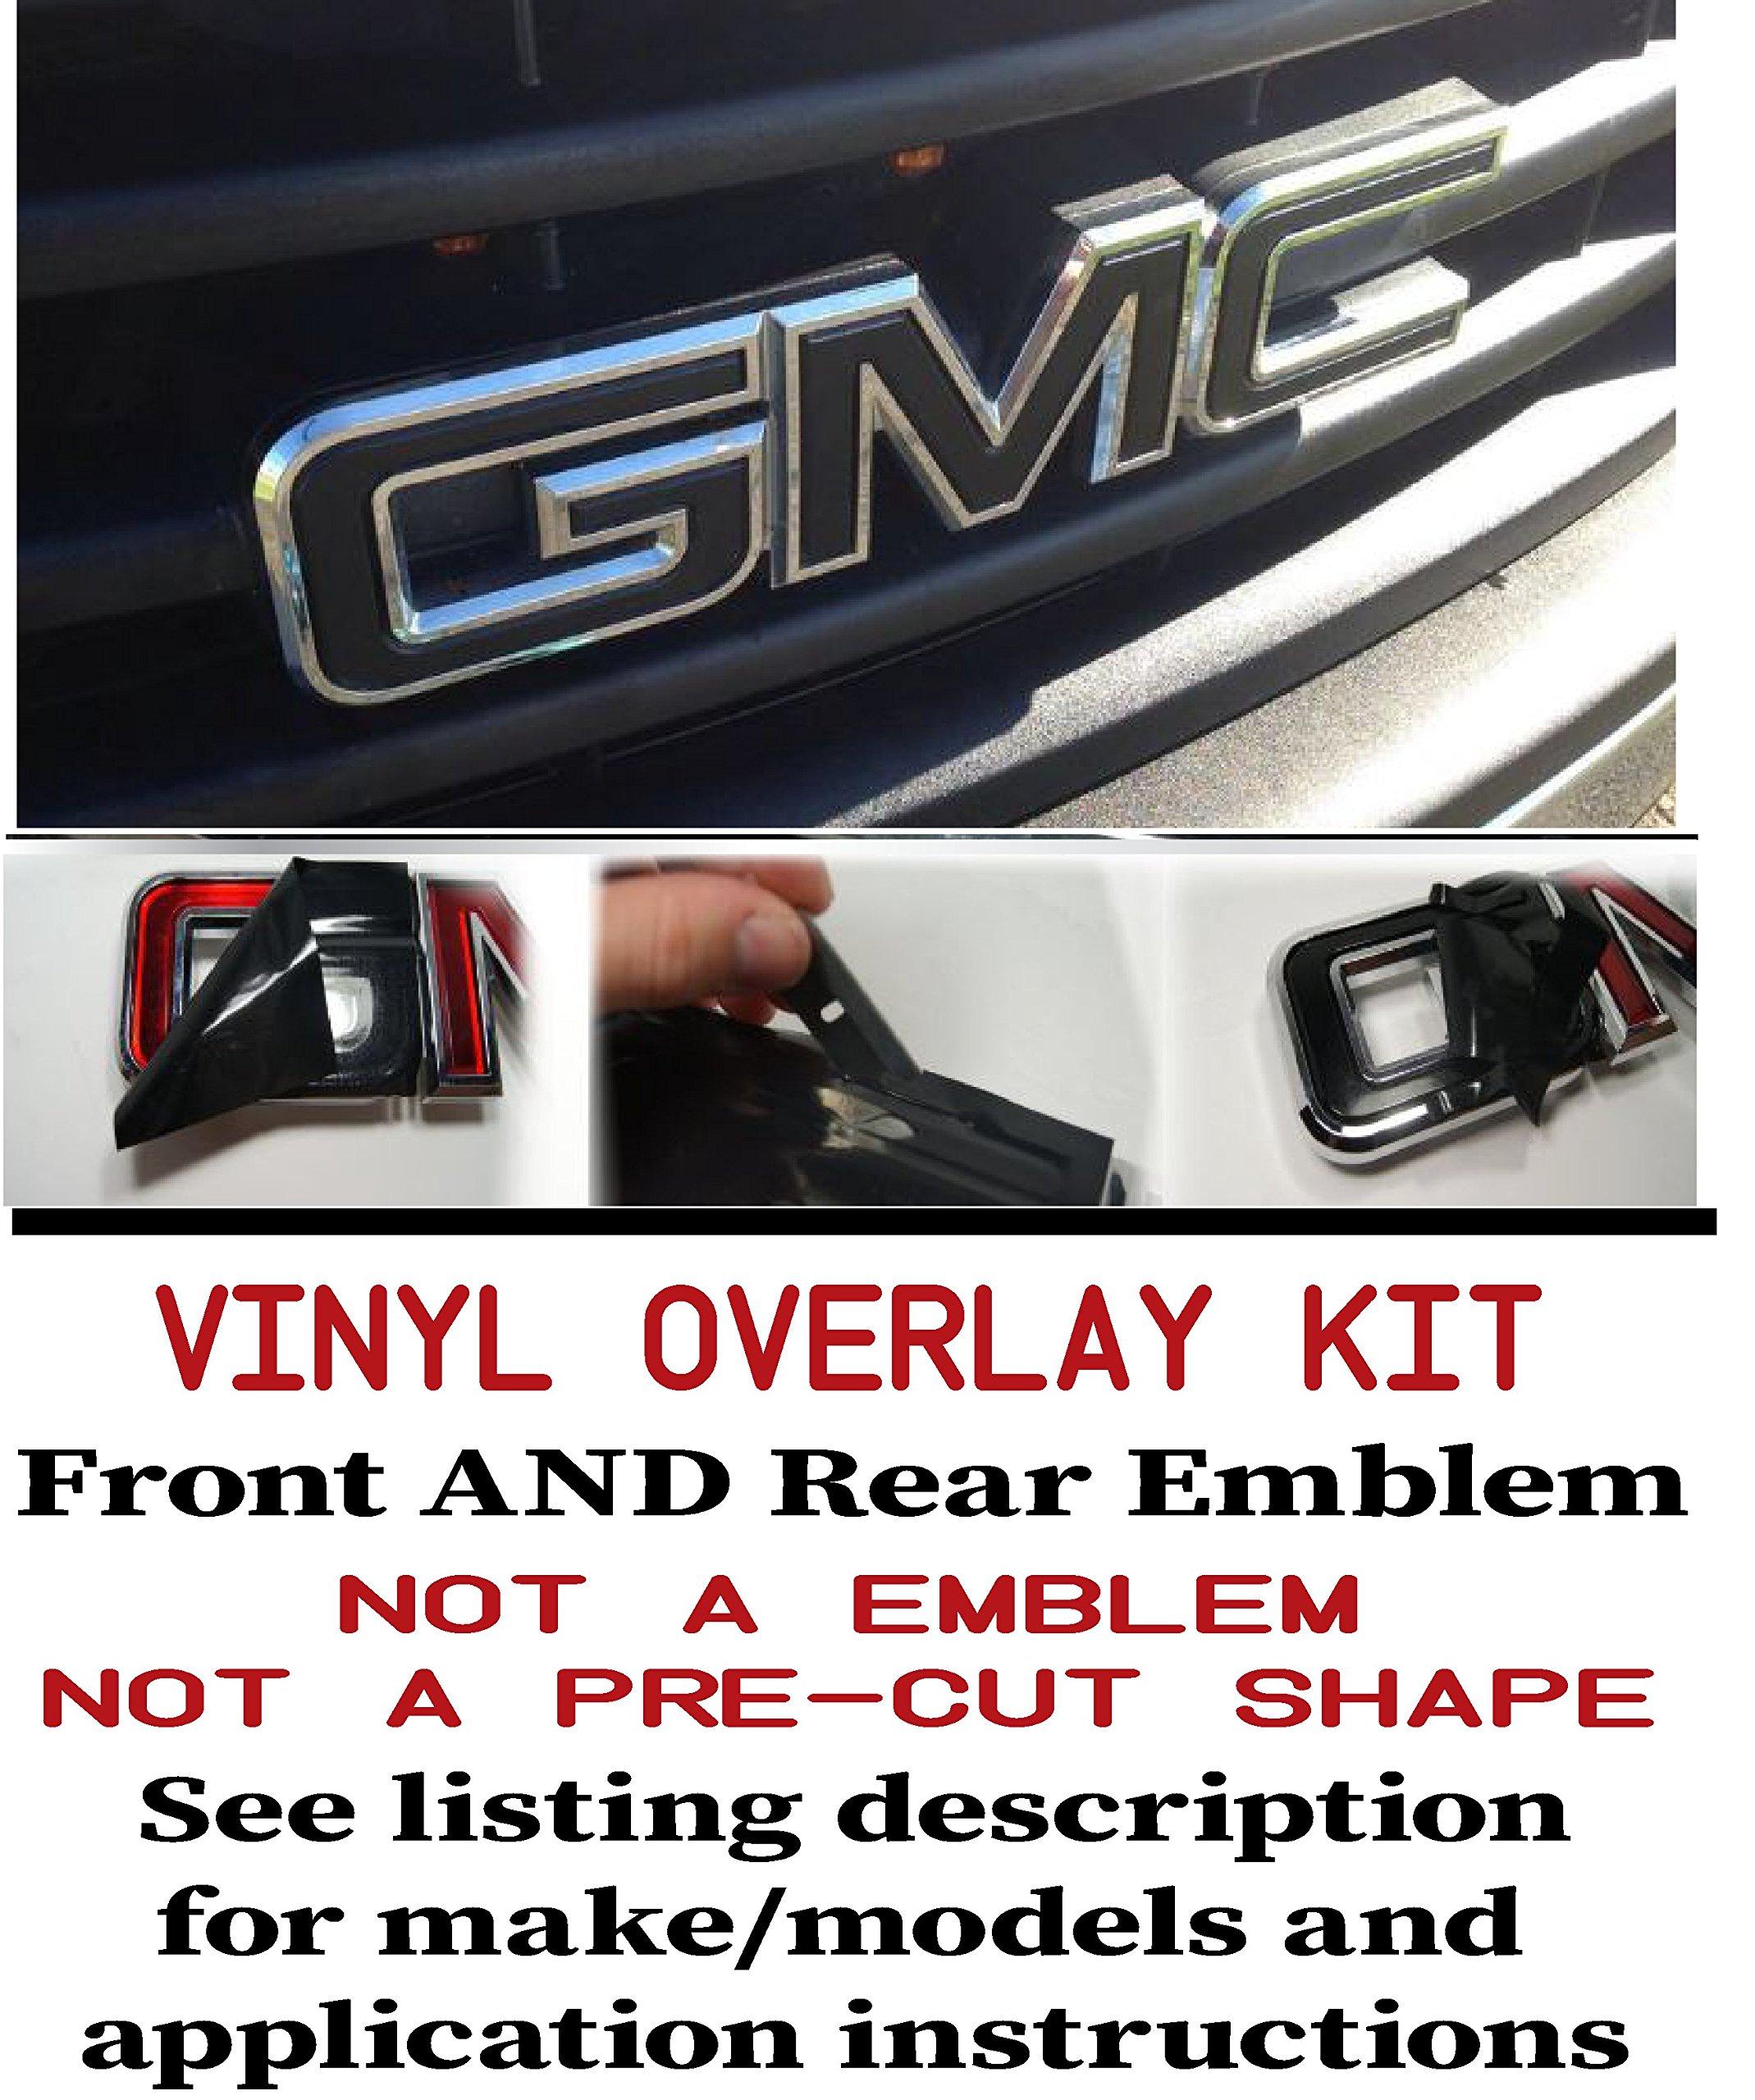 Oracal _ Shop Vinyl Design GMC Front and Rear Emblem Overlay